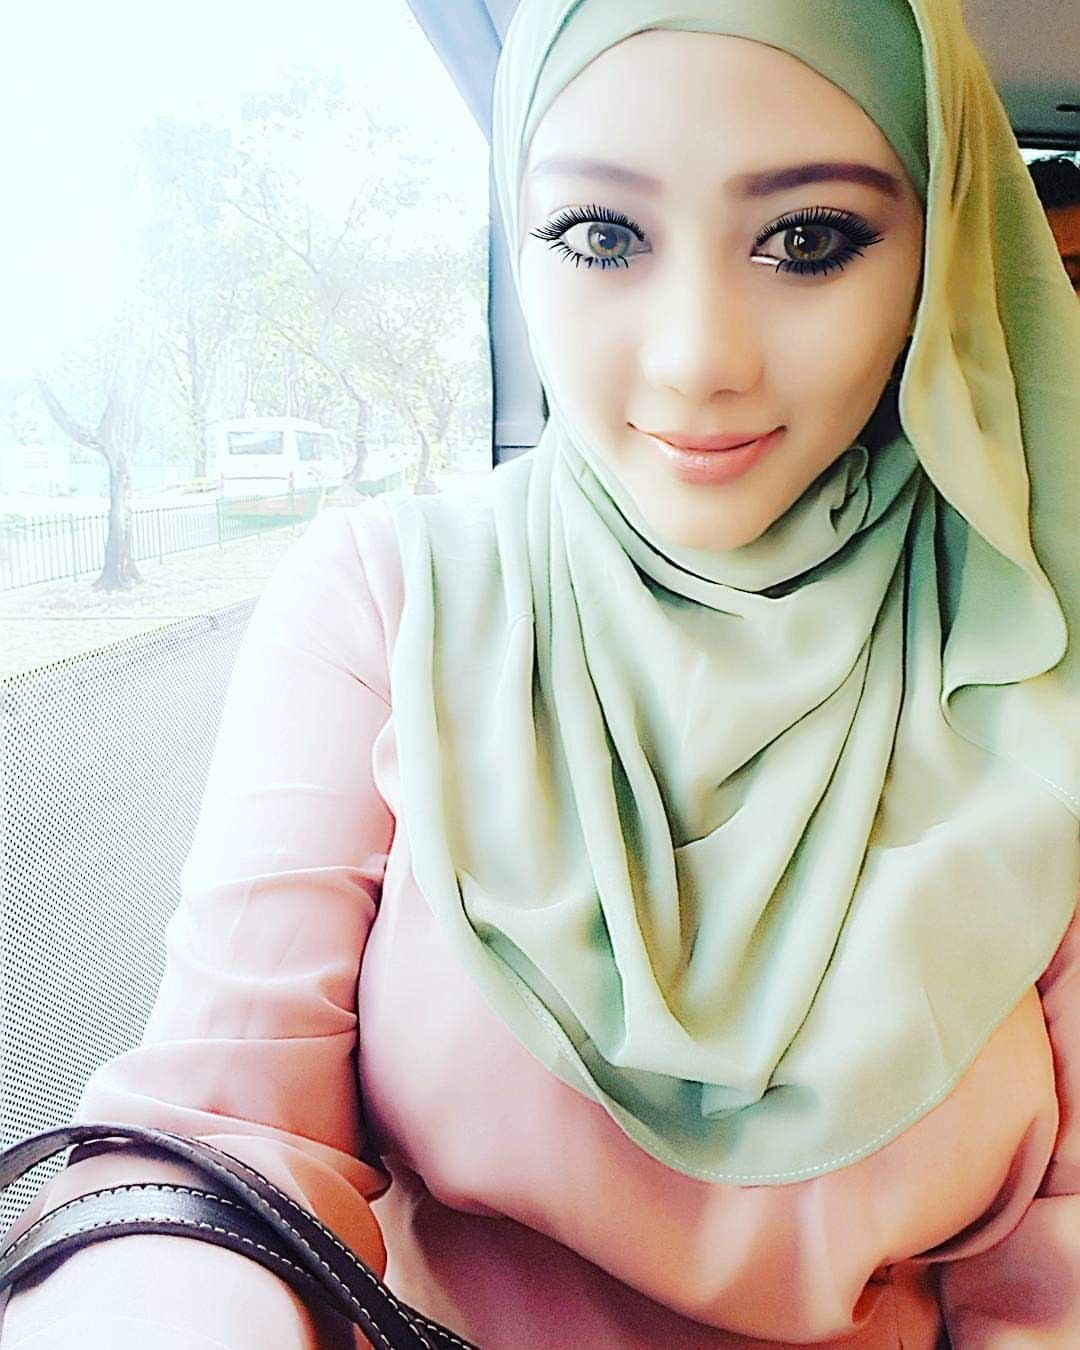 Beauty girls hijab pussy